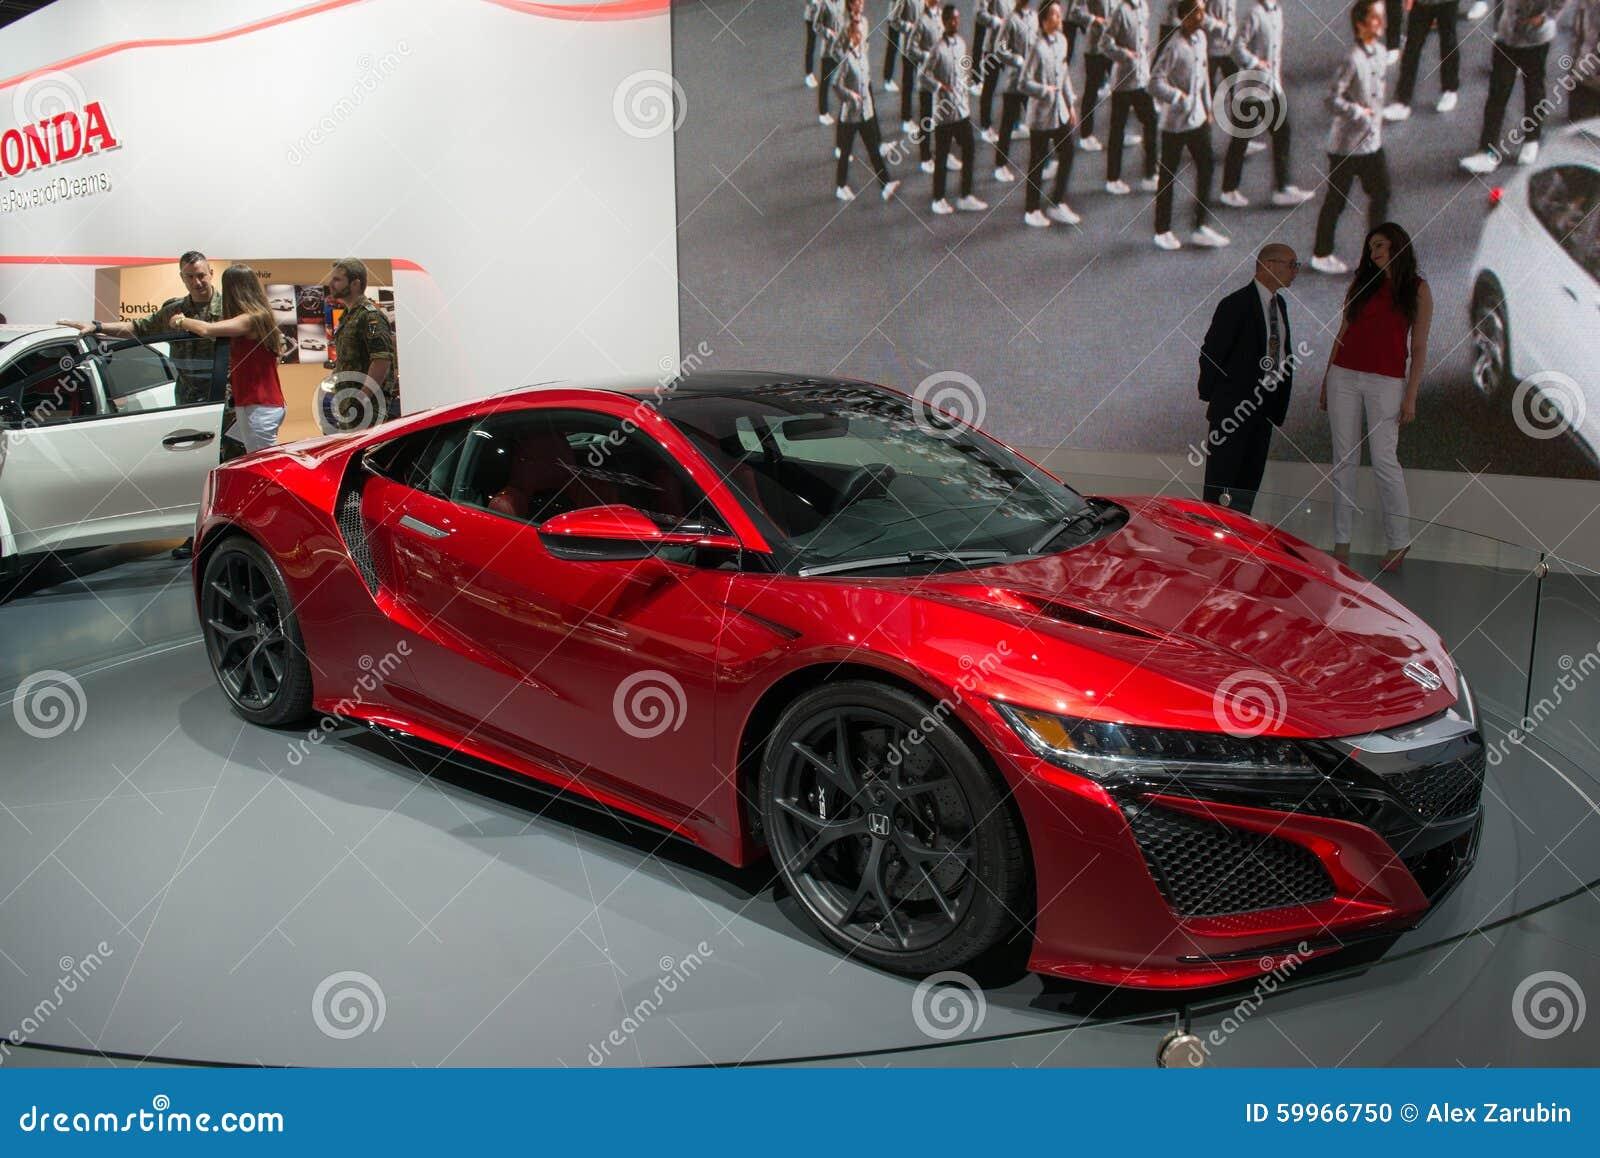 Honda Nsx Concept Editorial Image Image Of Closeup Salon 59966750